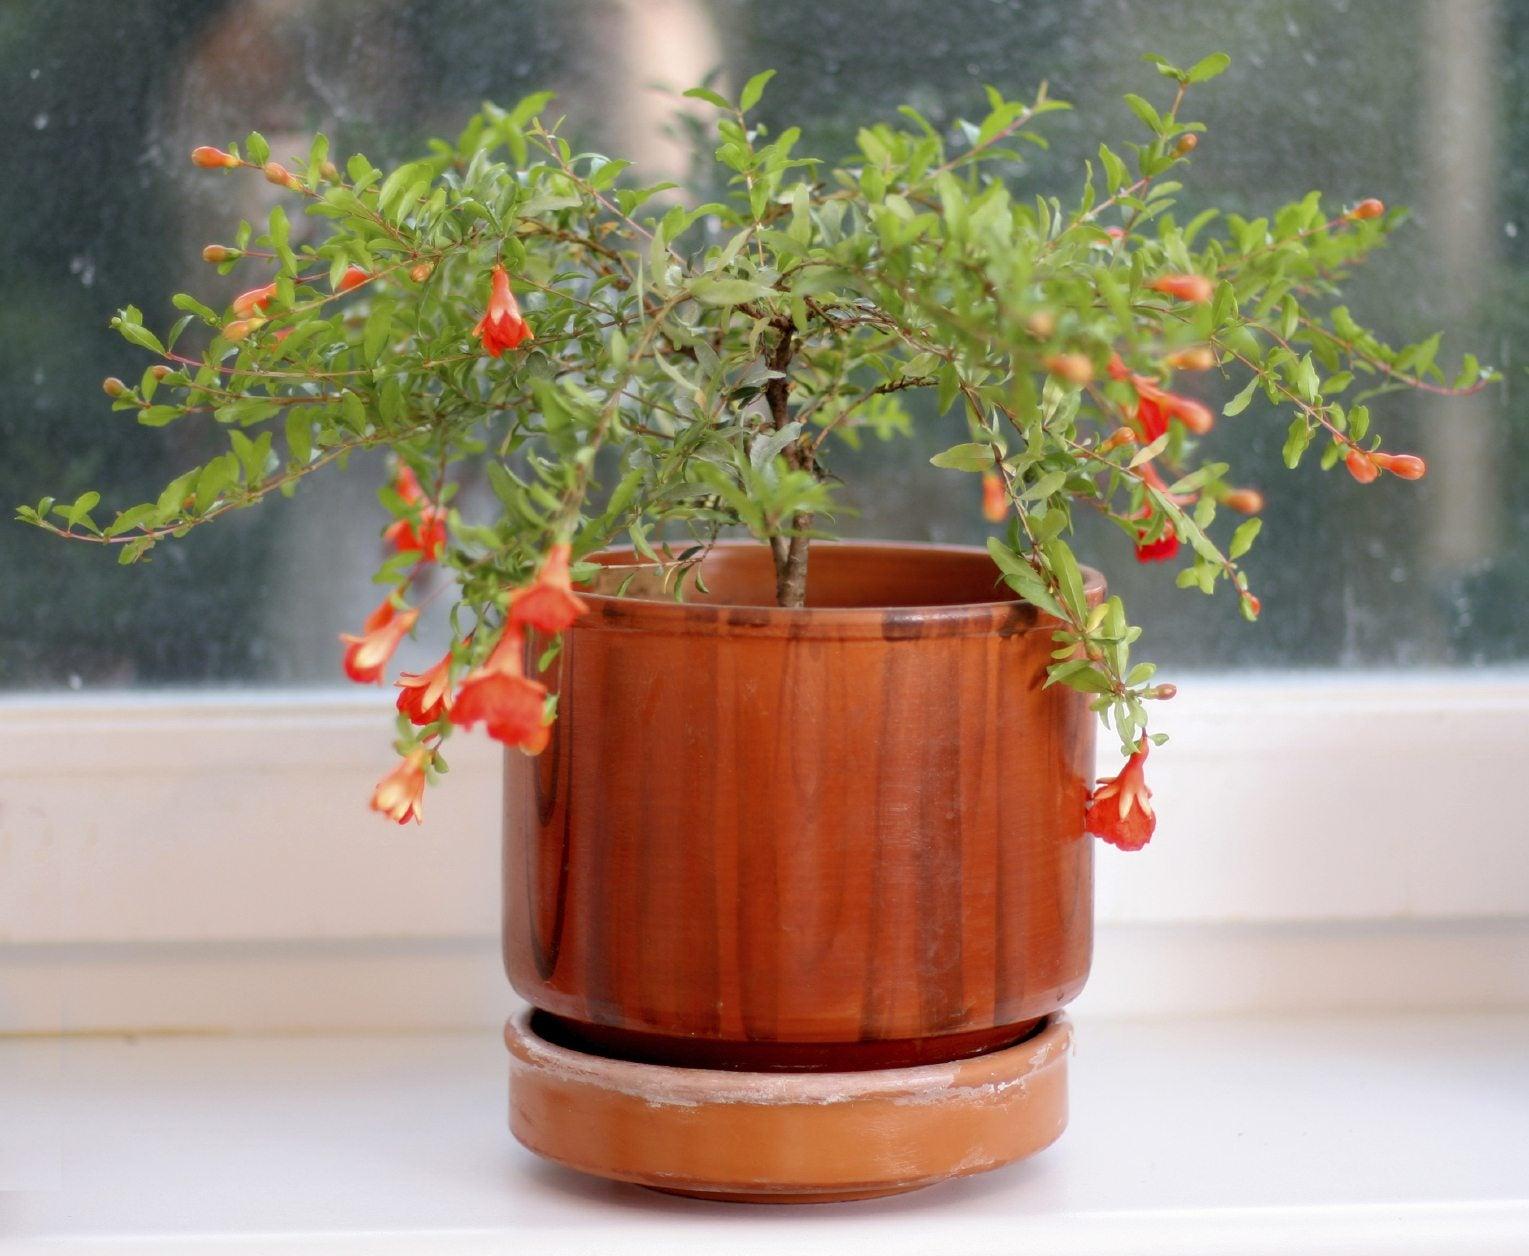 Pomegranate Houseplants – How To Grow Pomegranates Inside